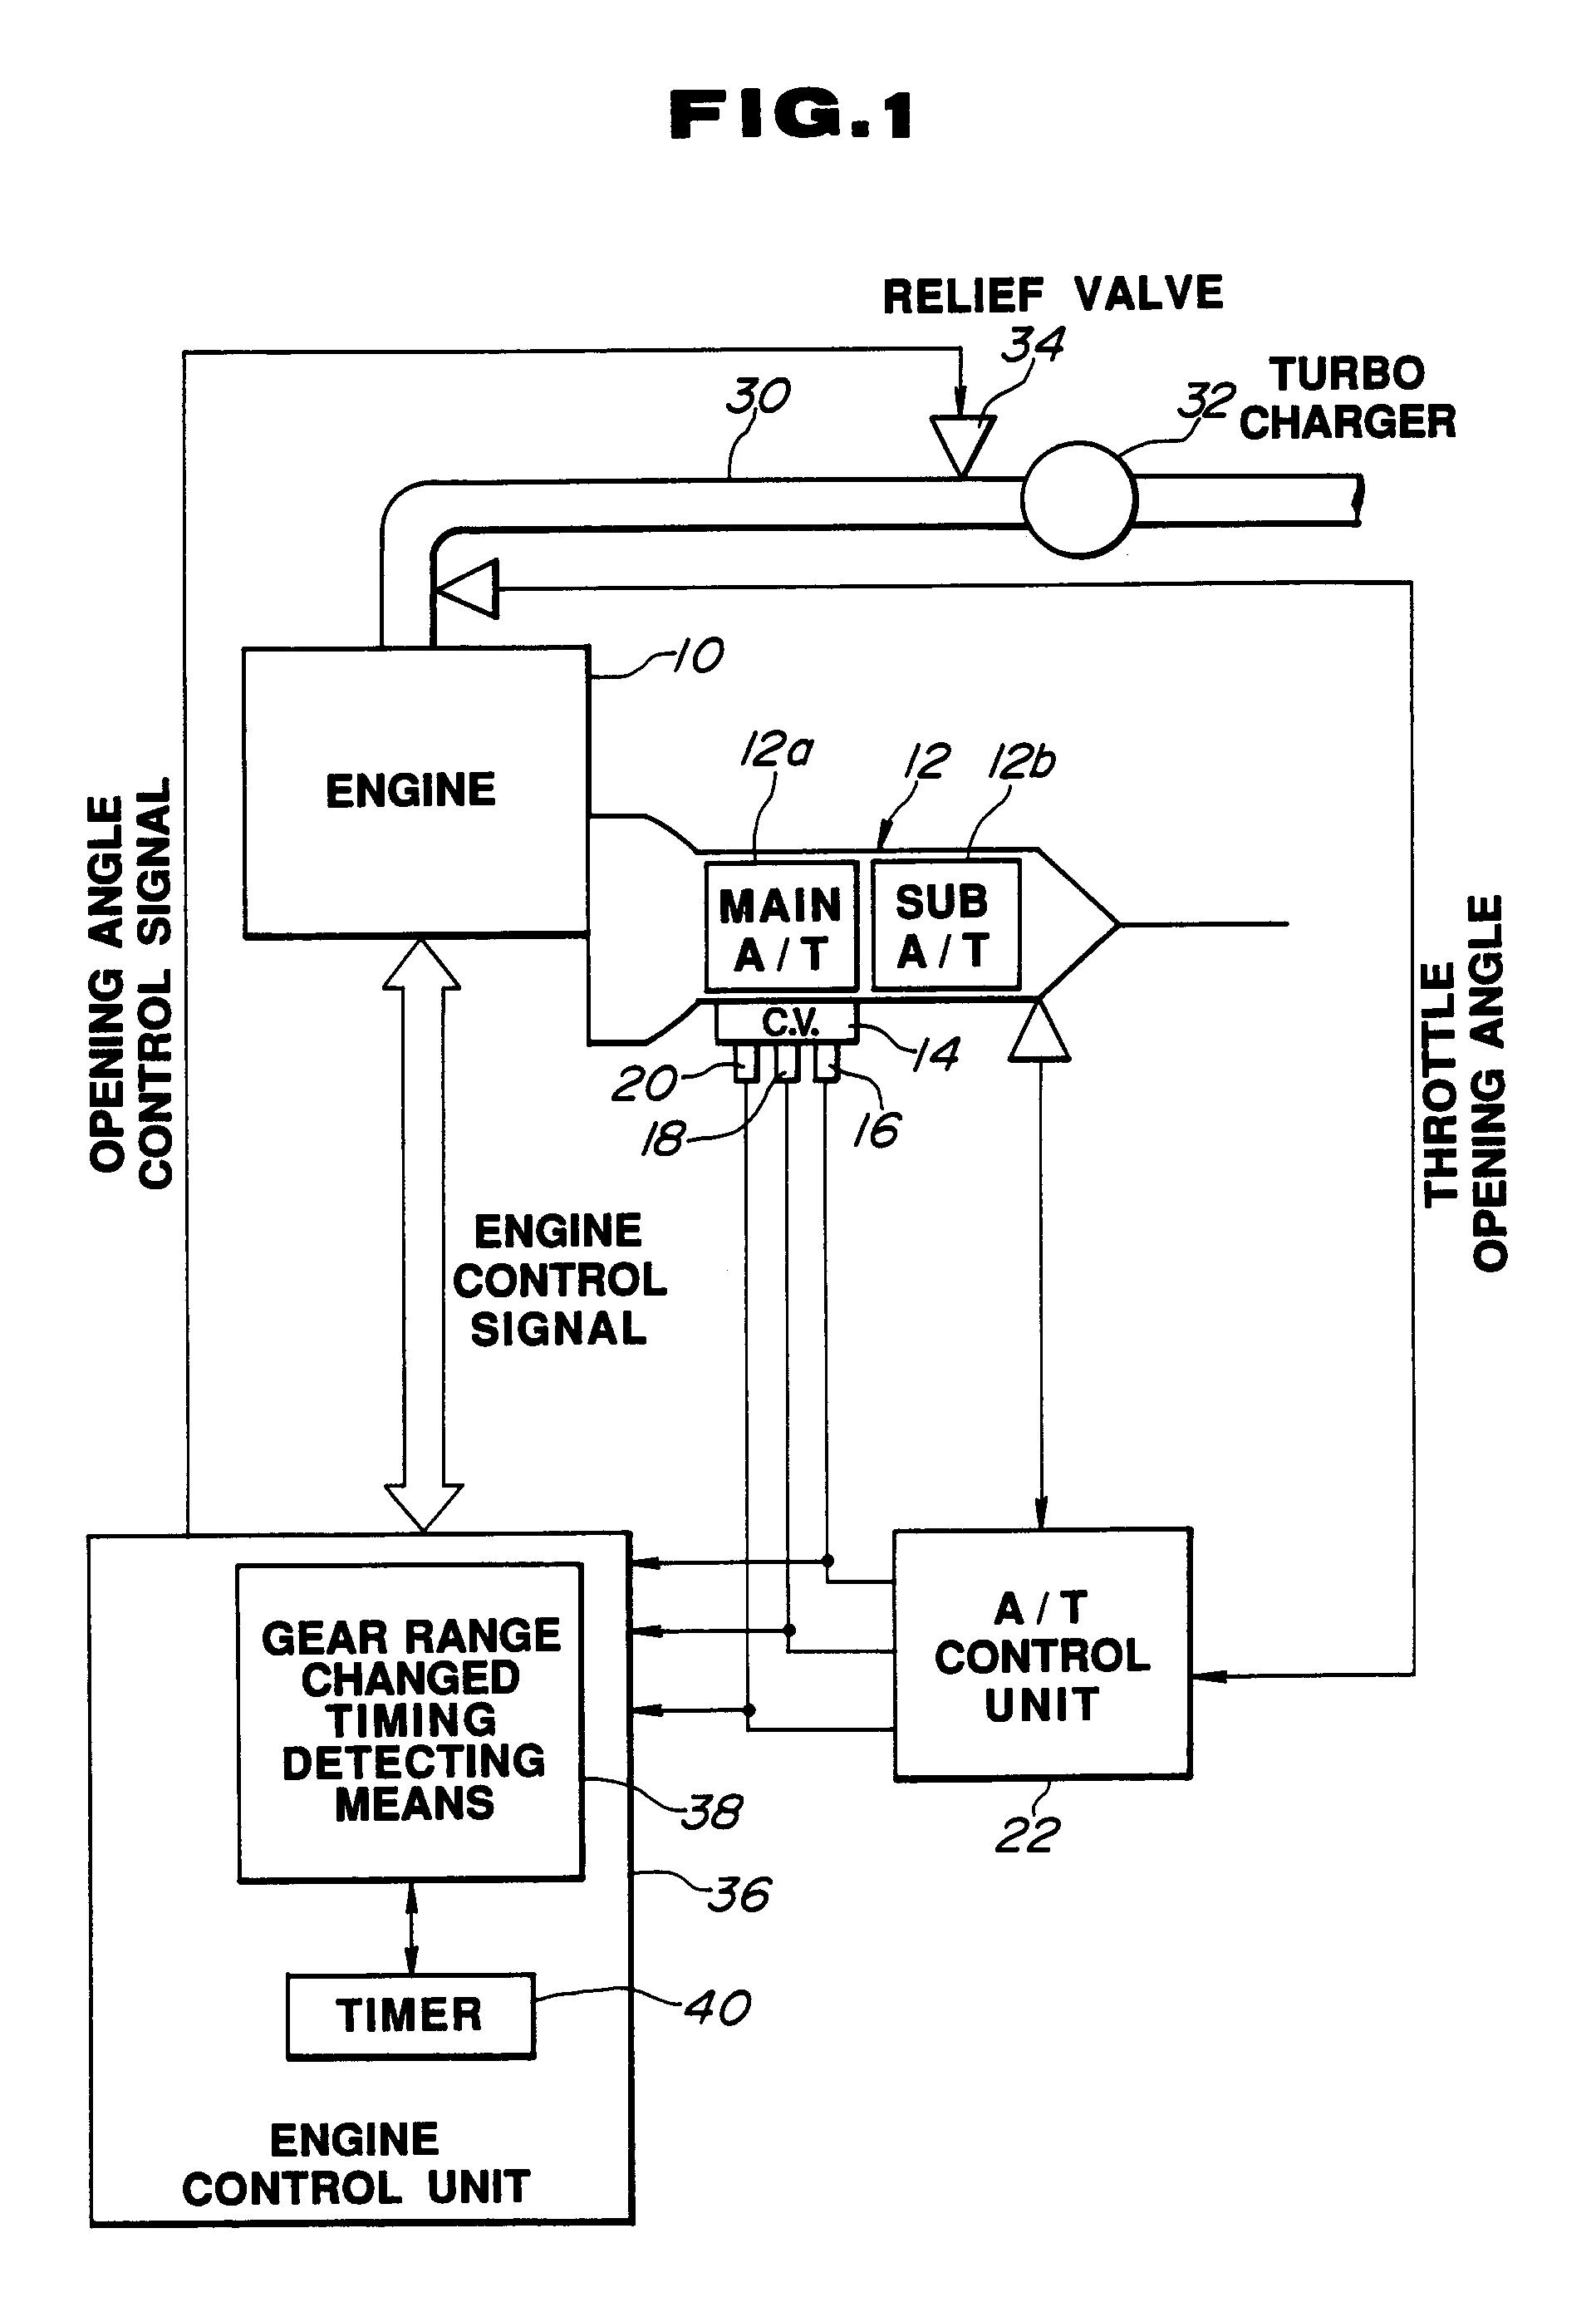 Manual Transmission Shifting Problems